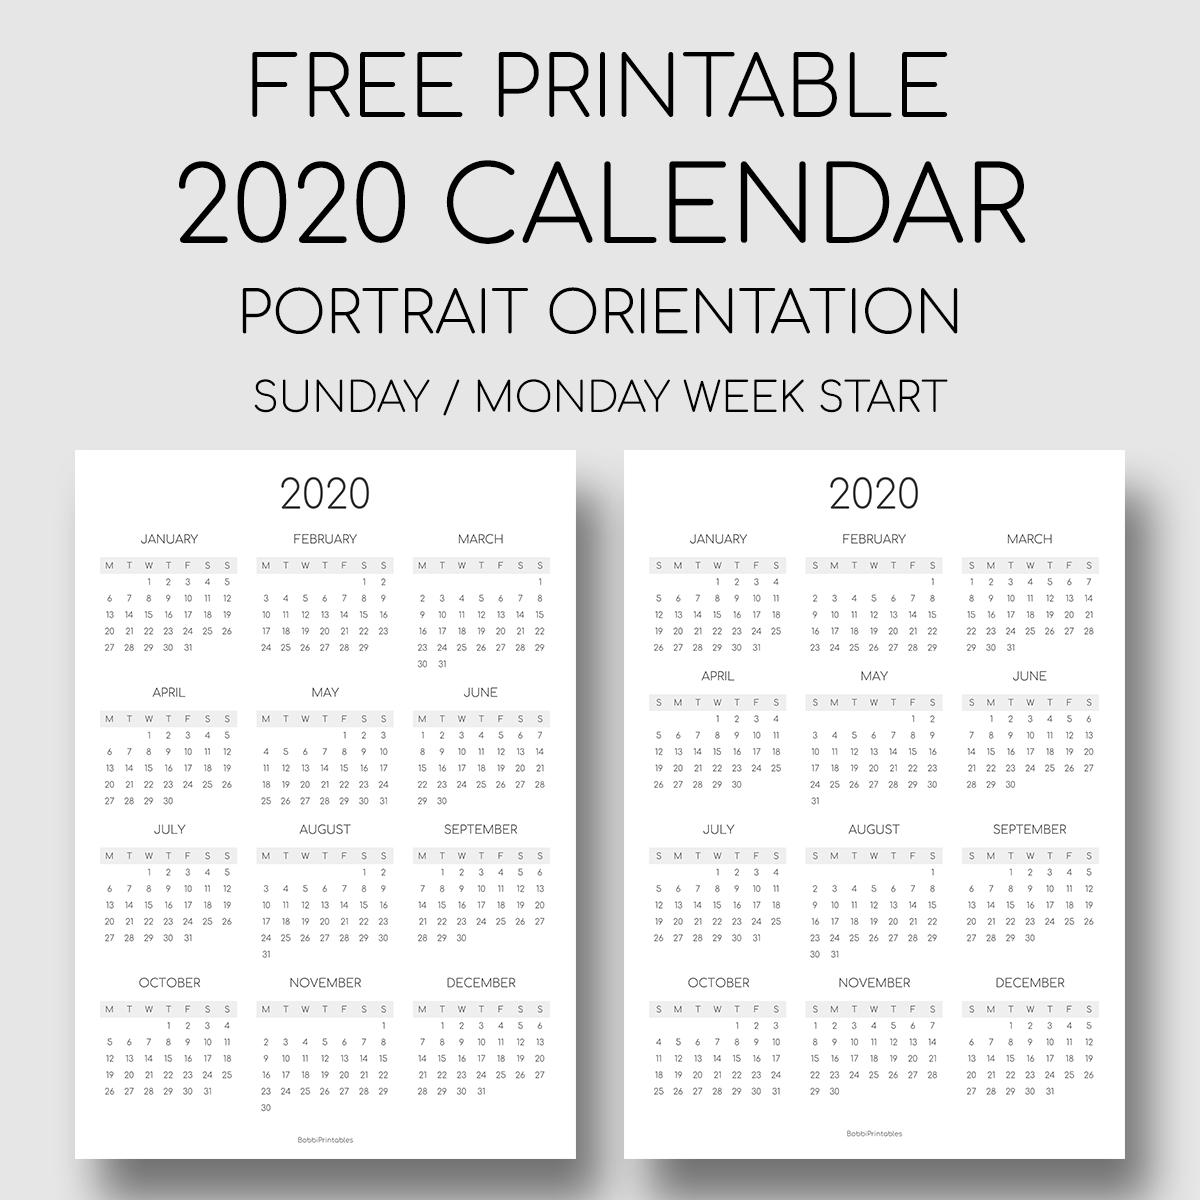 Printable 2020 Year At A Glance Calendar - Portrait Orientation pertaining to Year At A Glance Calendar 2020 Free Printable Mondayt Start